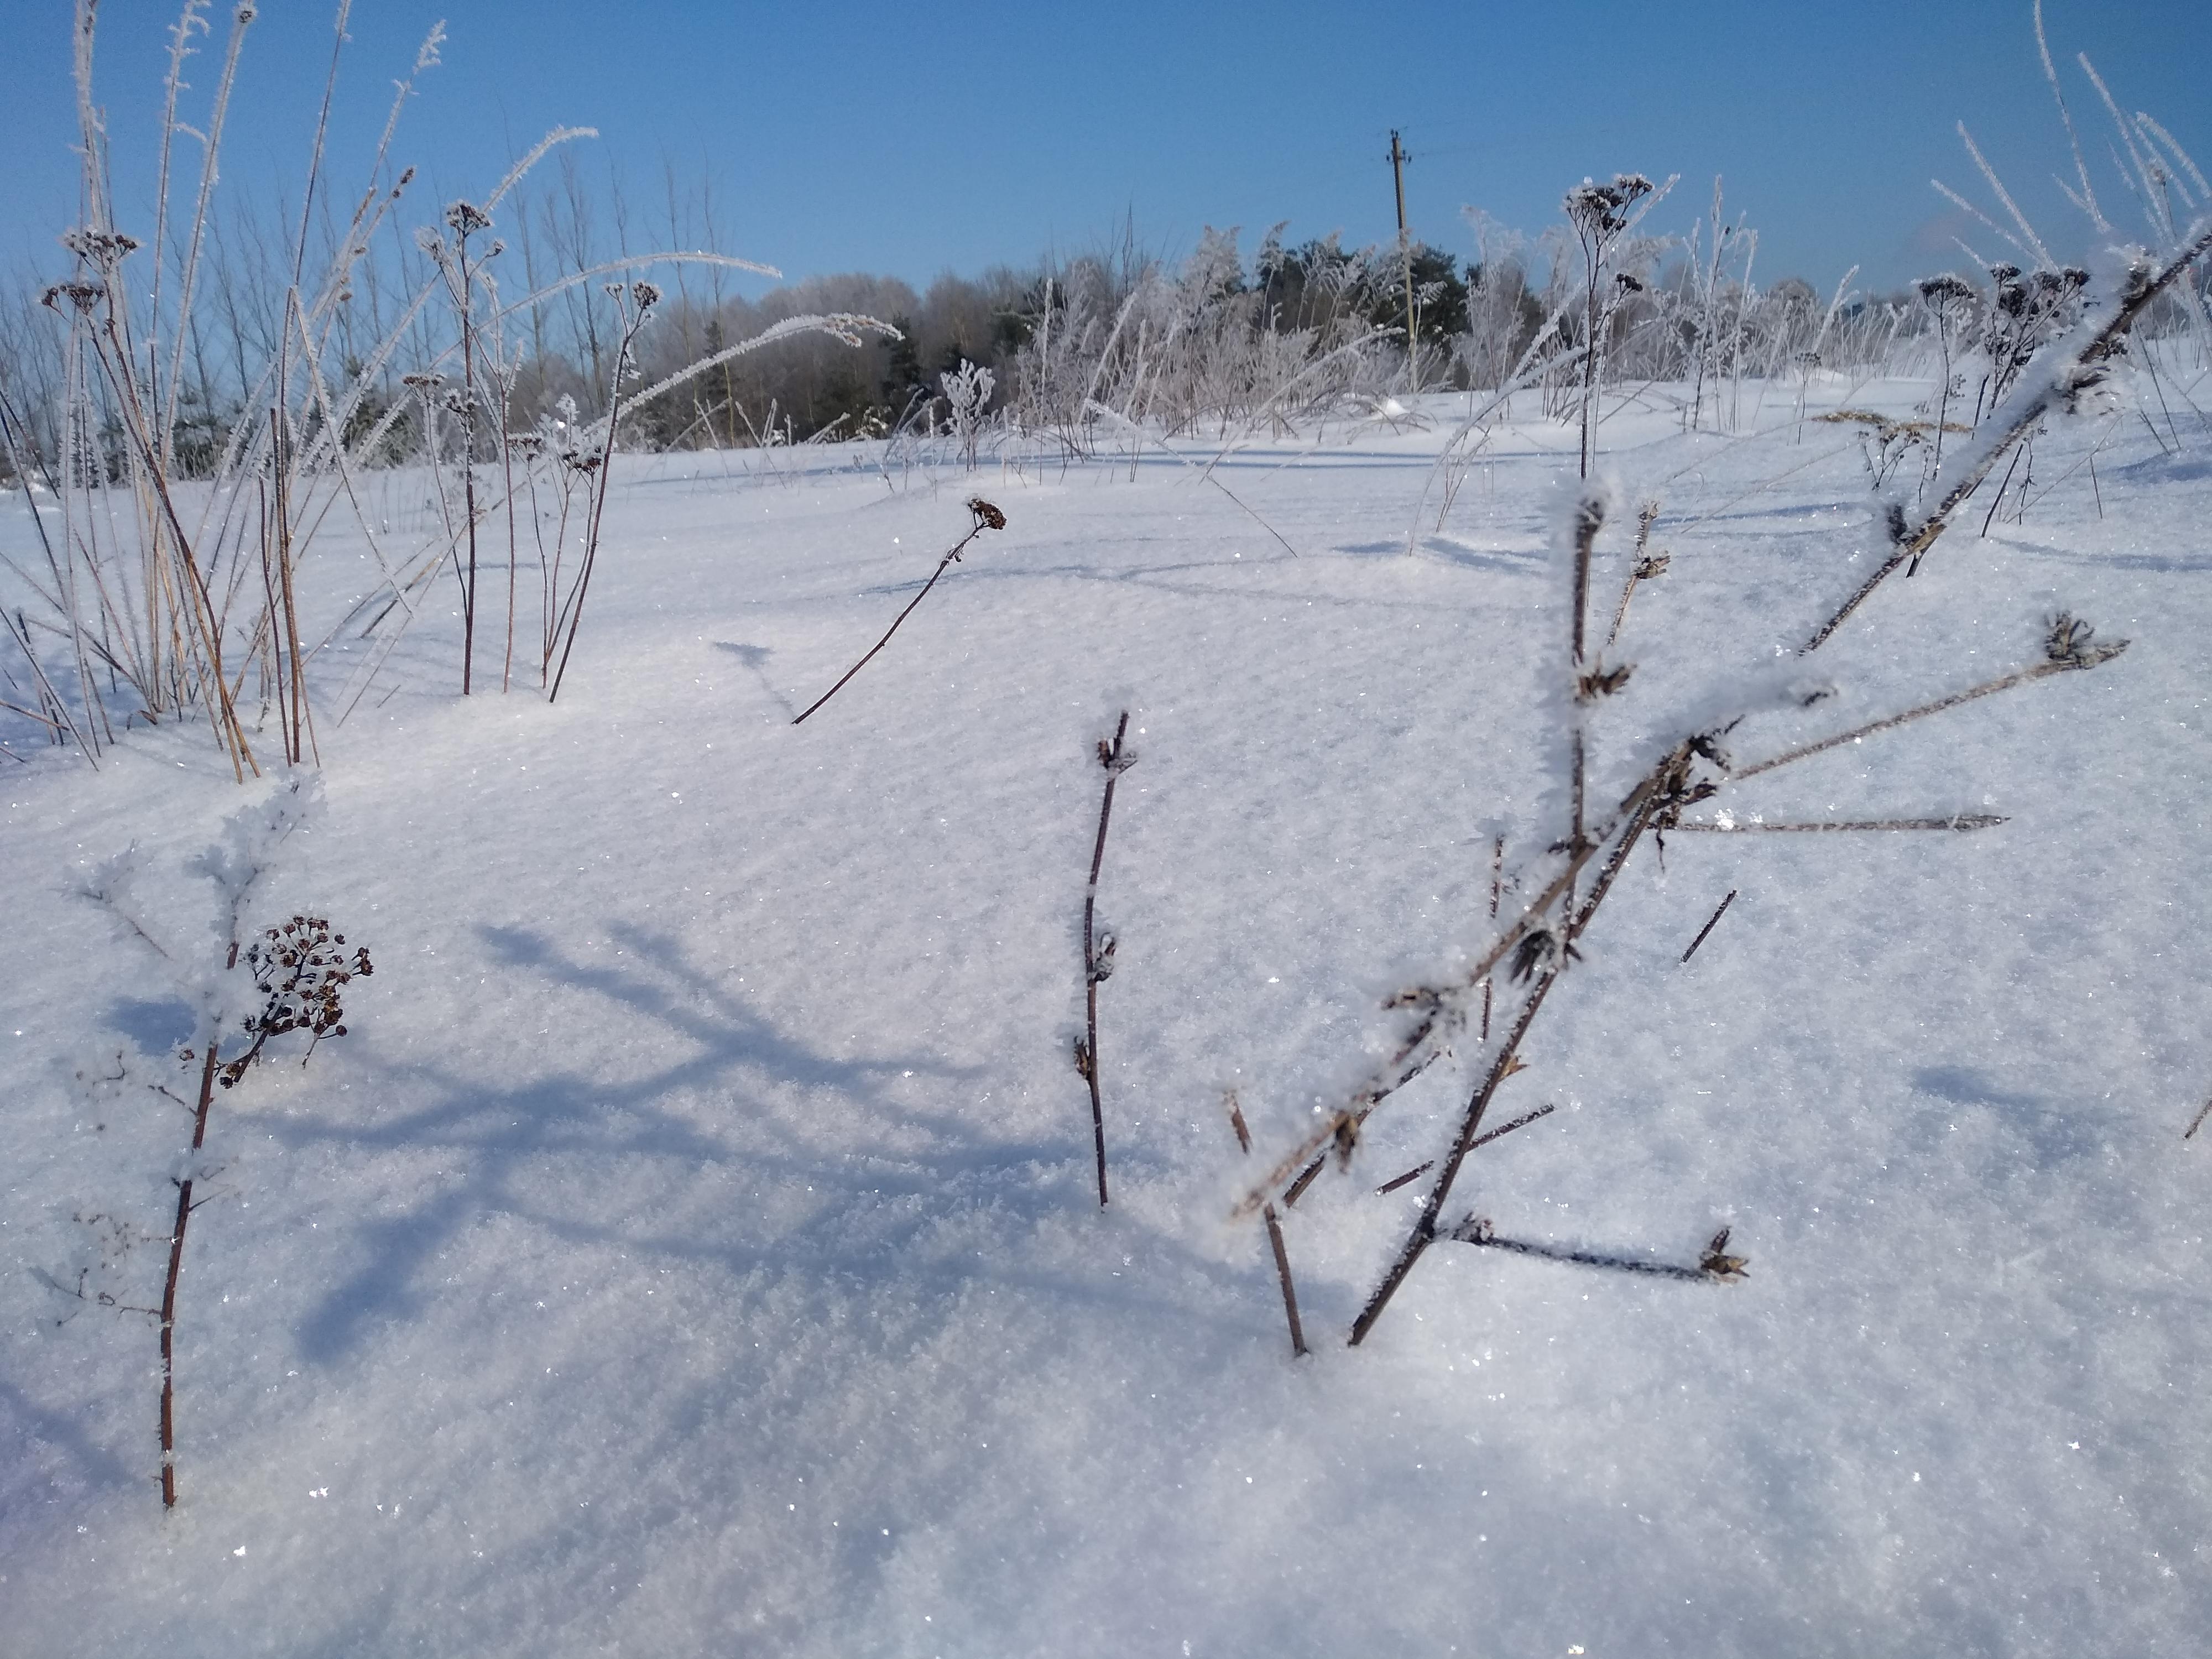 Nature resting under snow